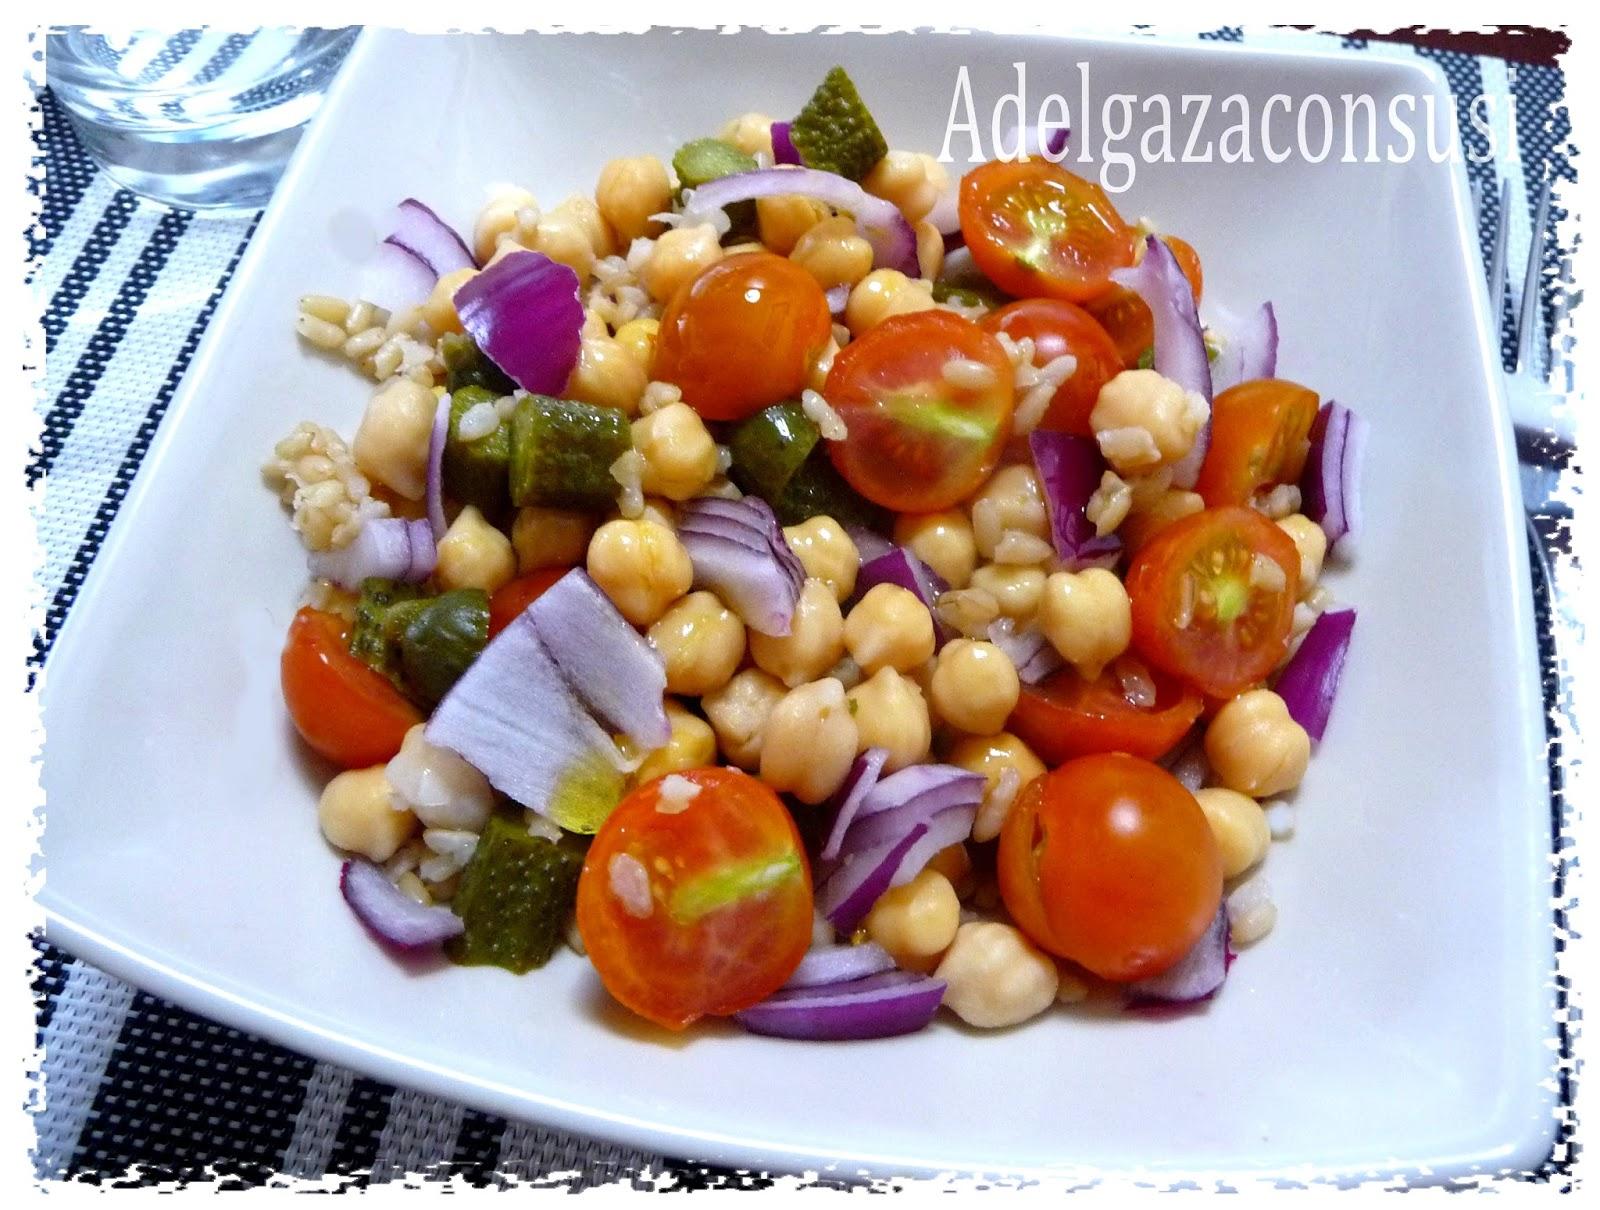 Recetas light adelgazaconsusi ensalada de garbanzos y - Ensalada de arroz light ...